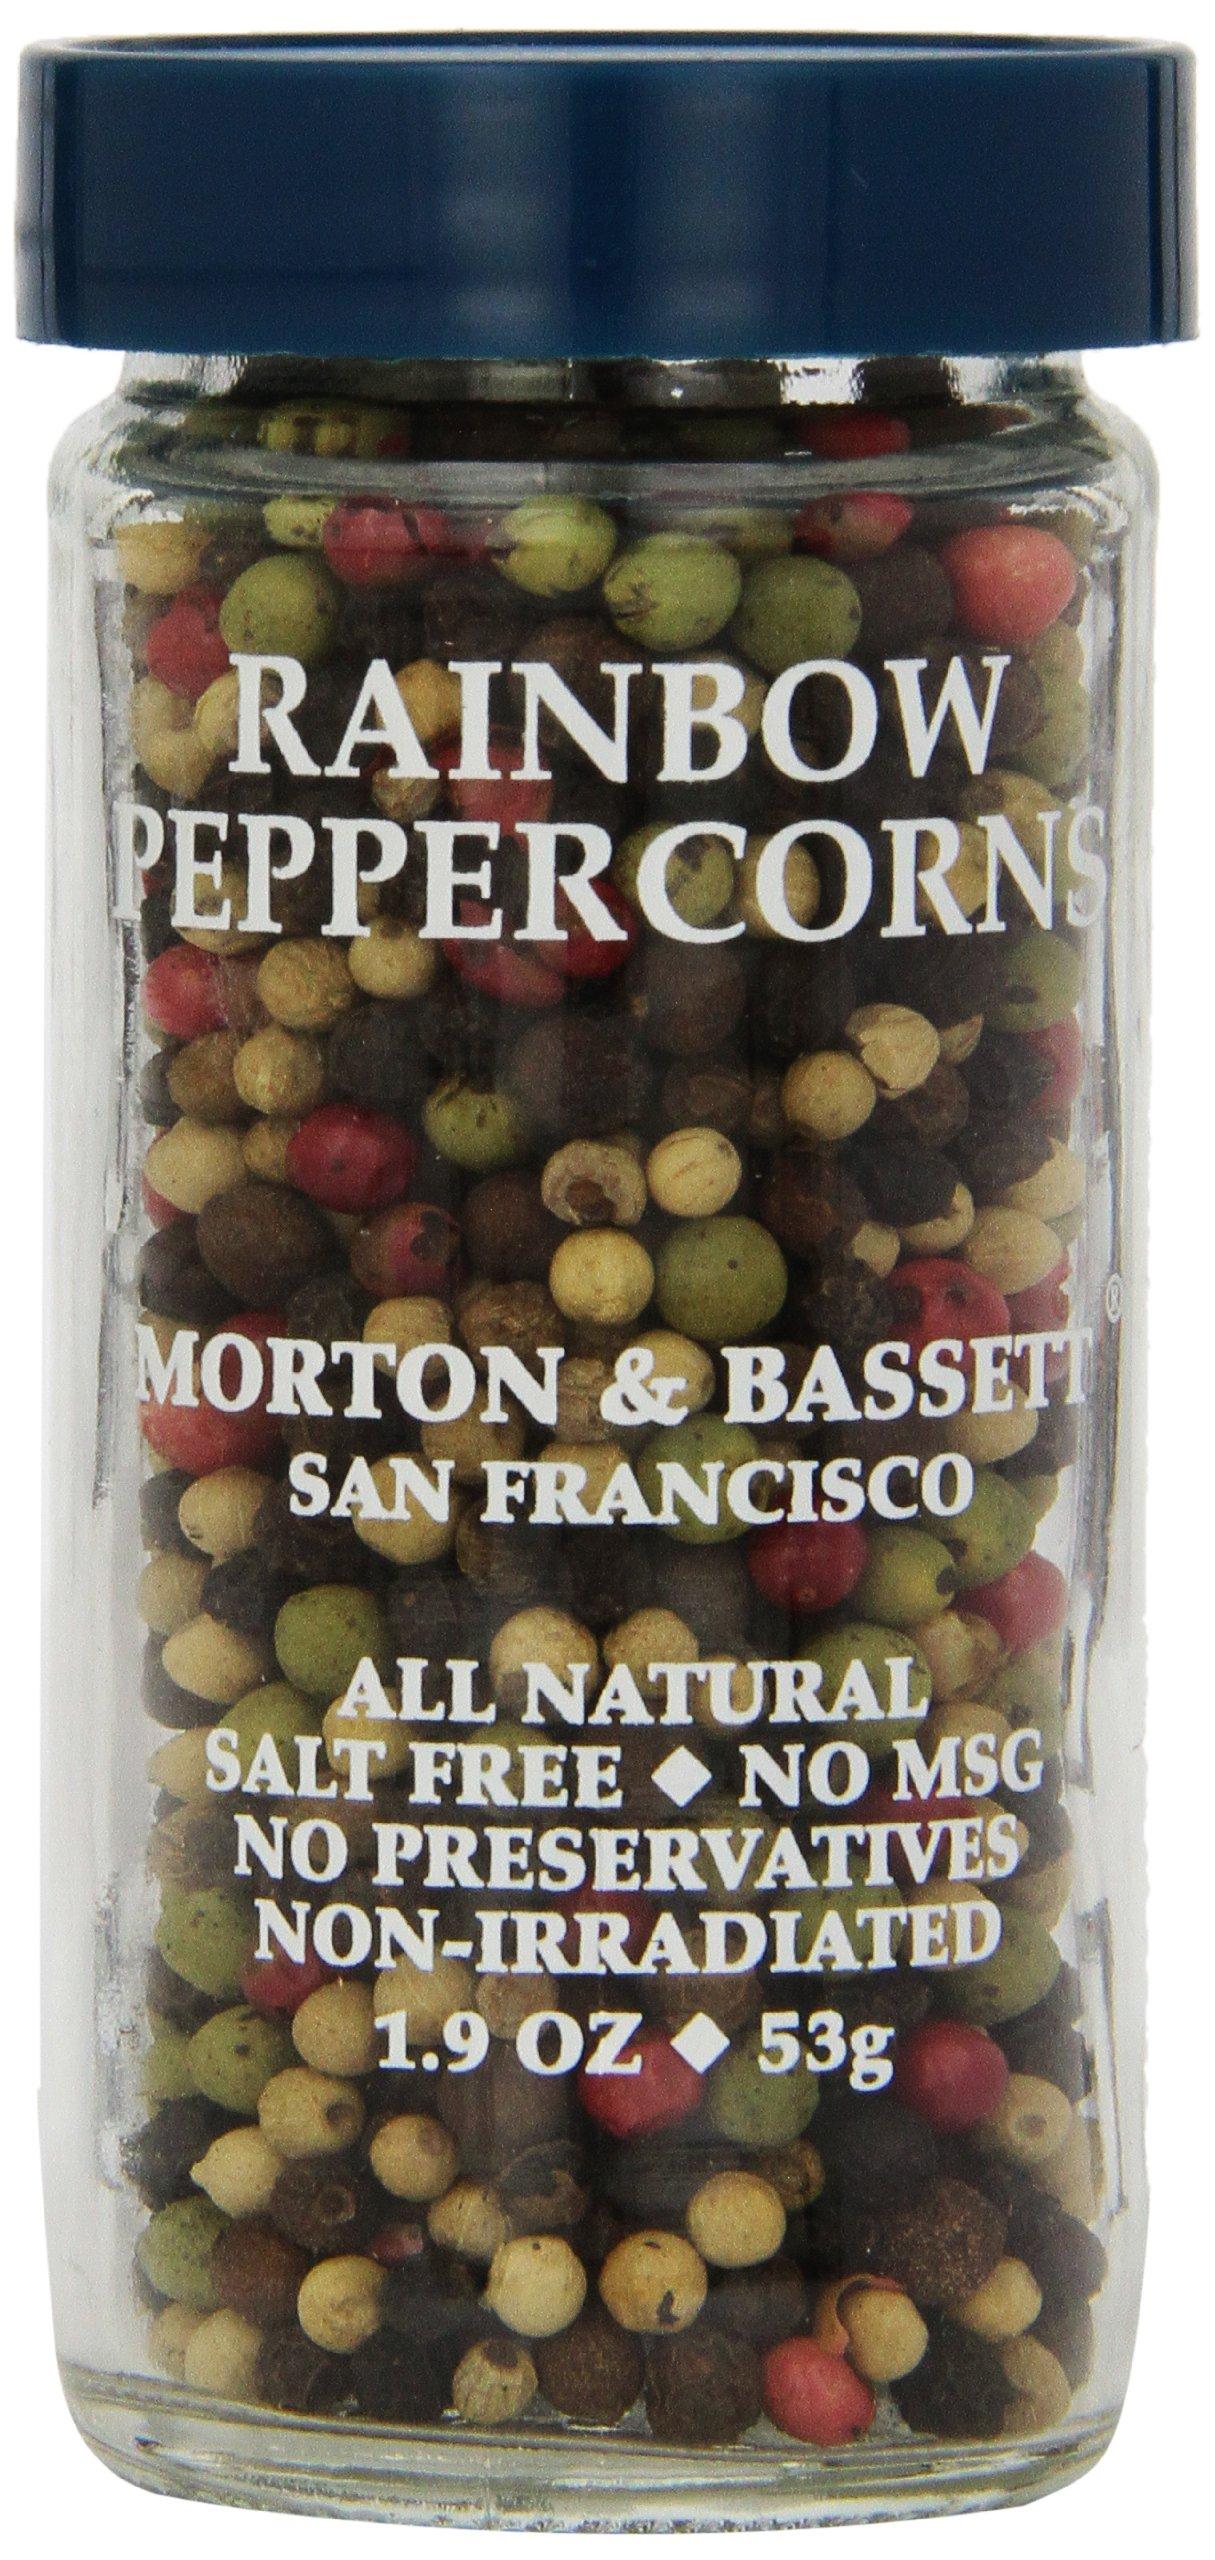 Morton & Bassett Peppercorns, Rainbow (Whole), 1.9 Ounce